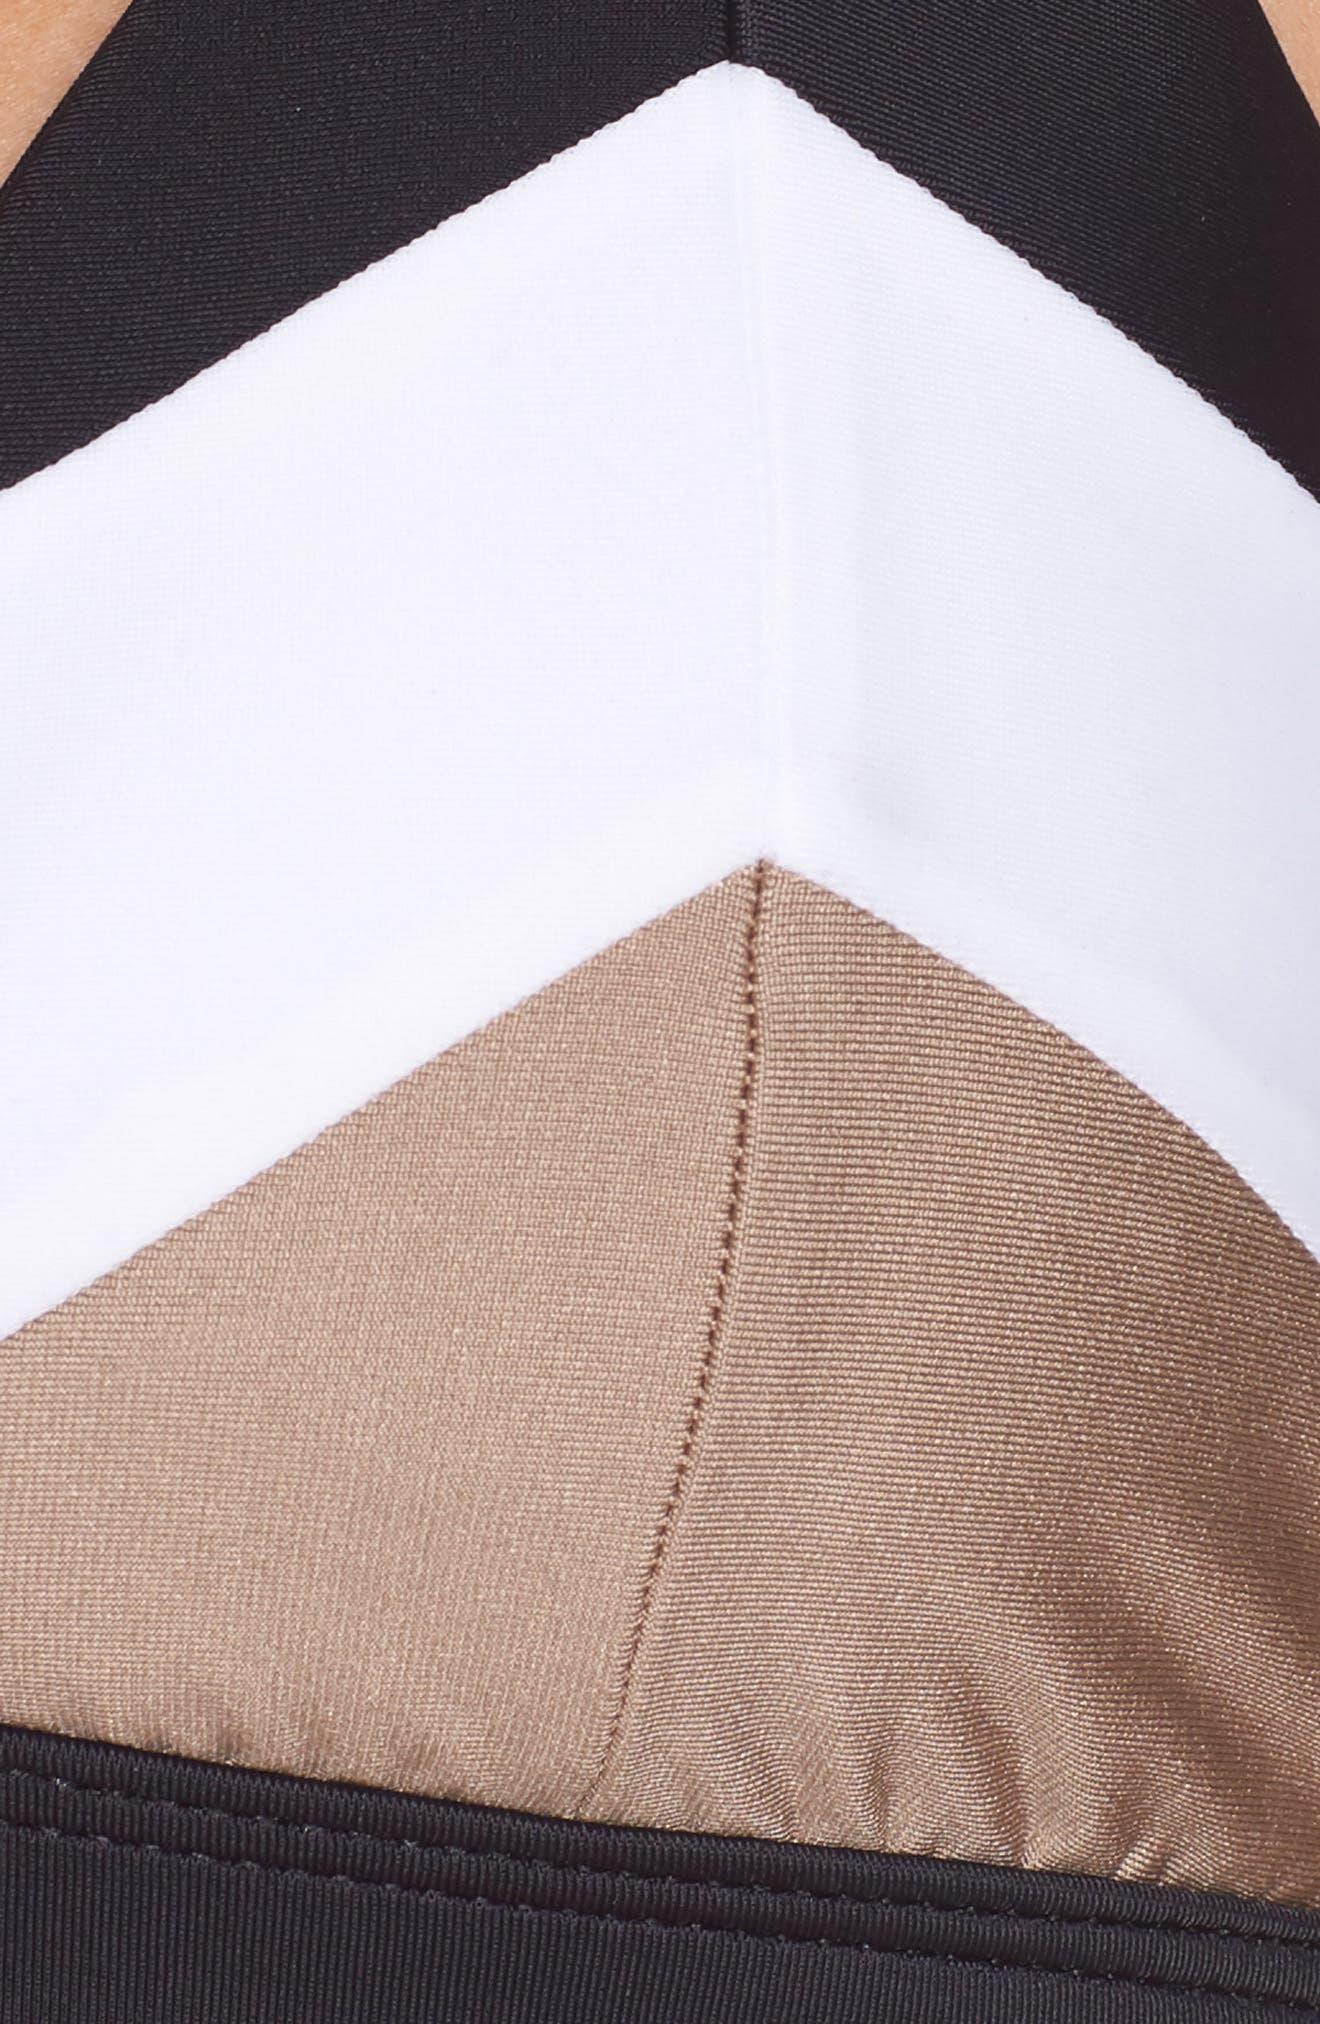 Colorblock Triangle Bikini Top,                             Alternate thumbnail 6, color,                             CADILLAC